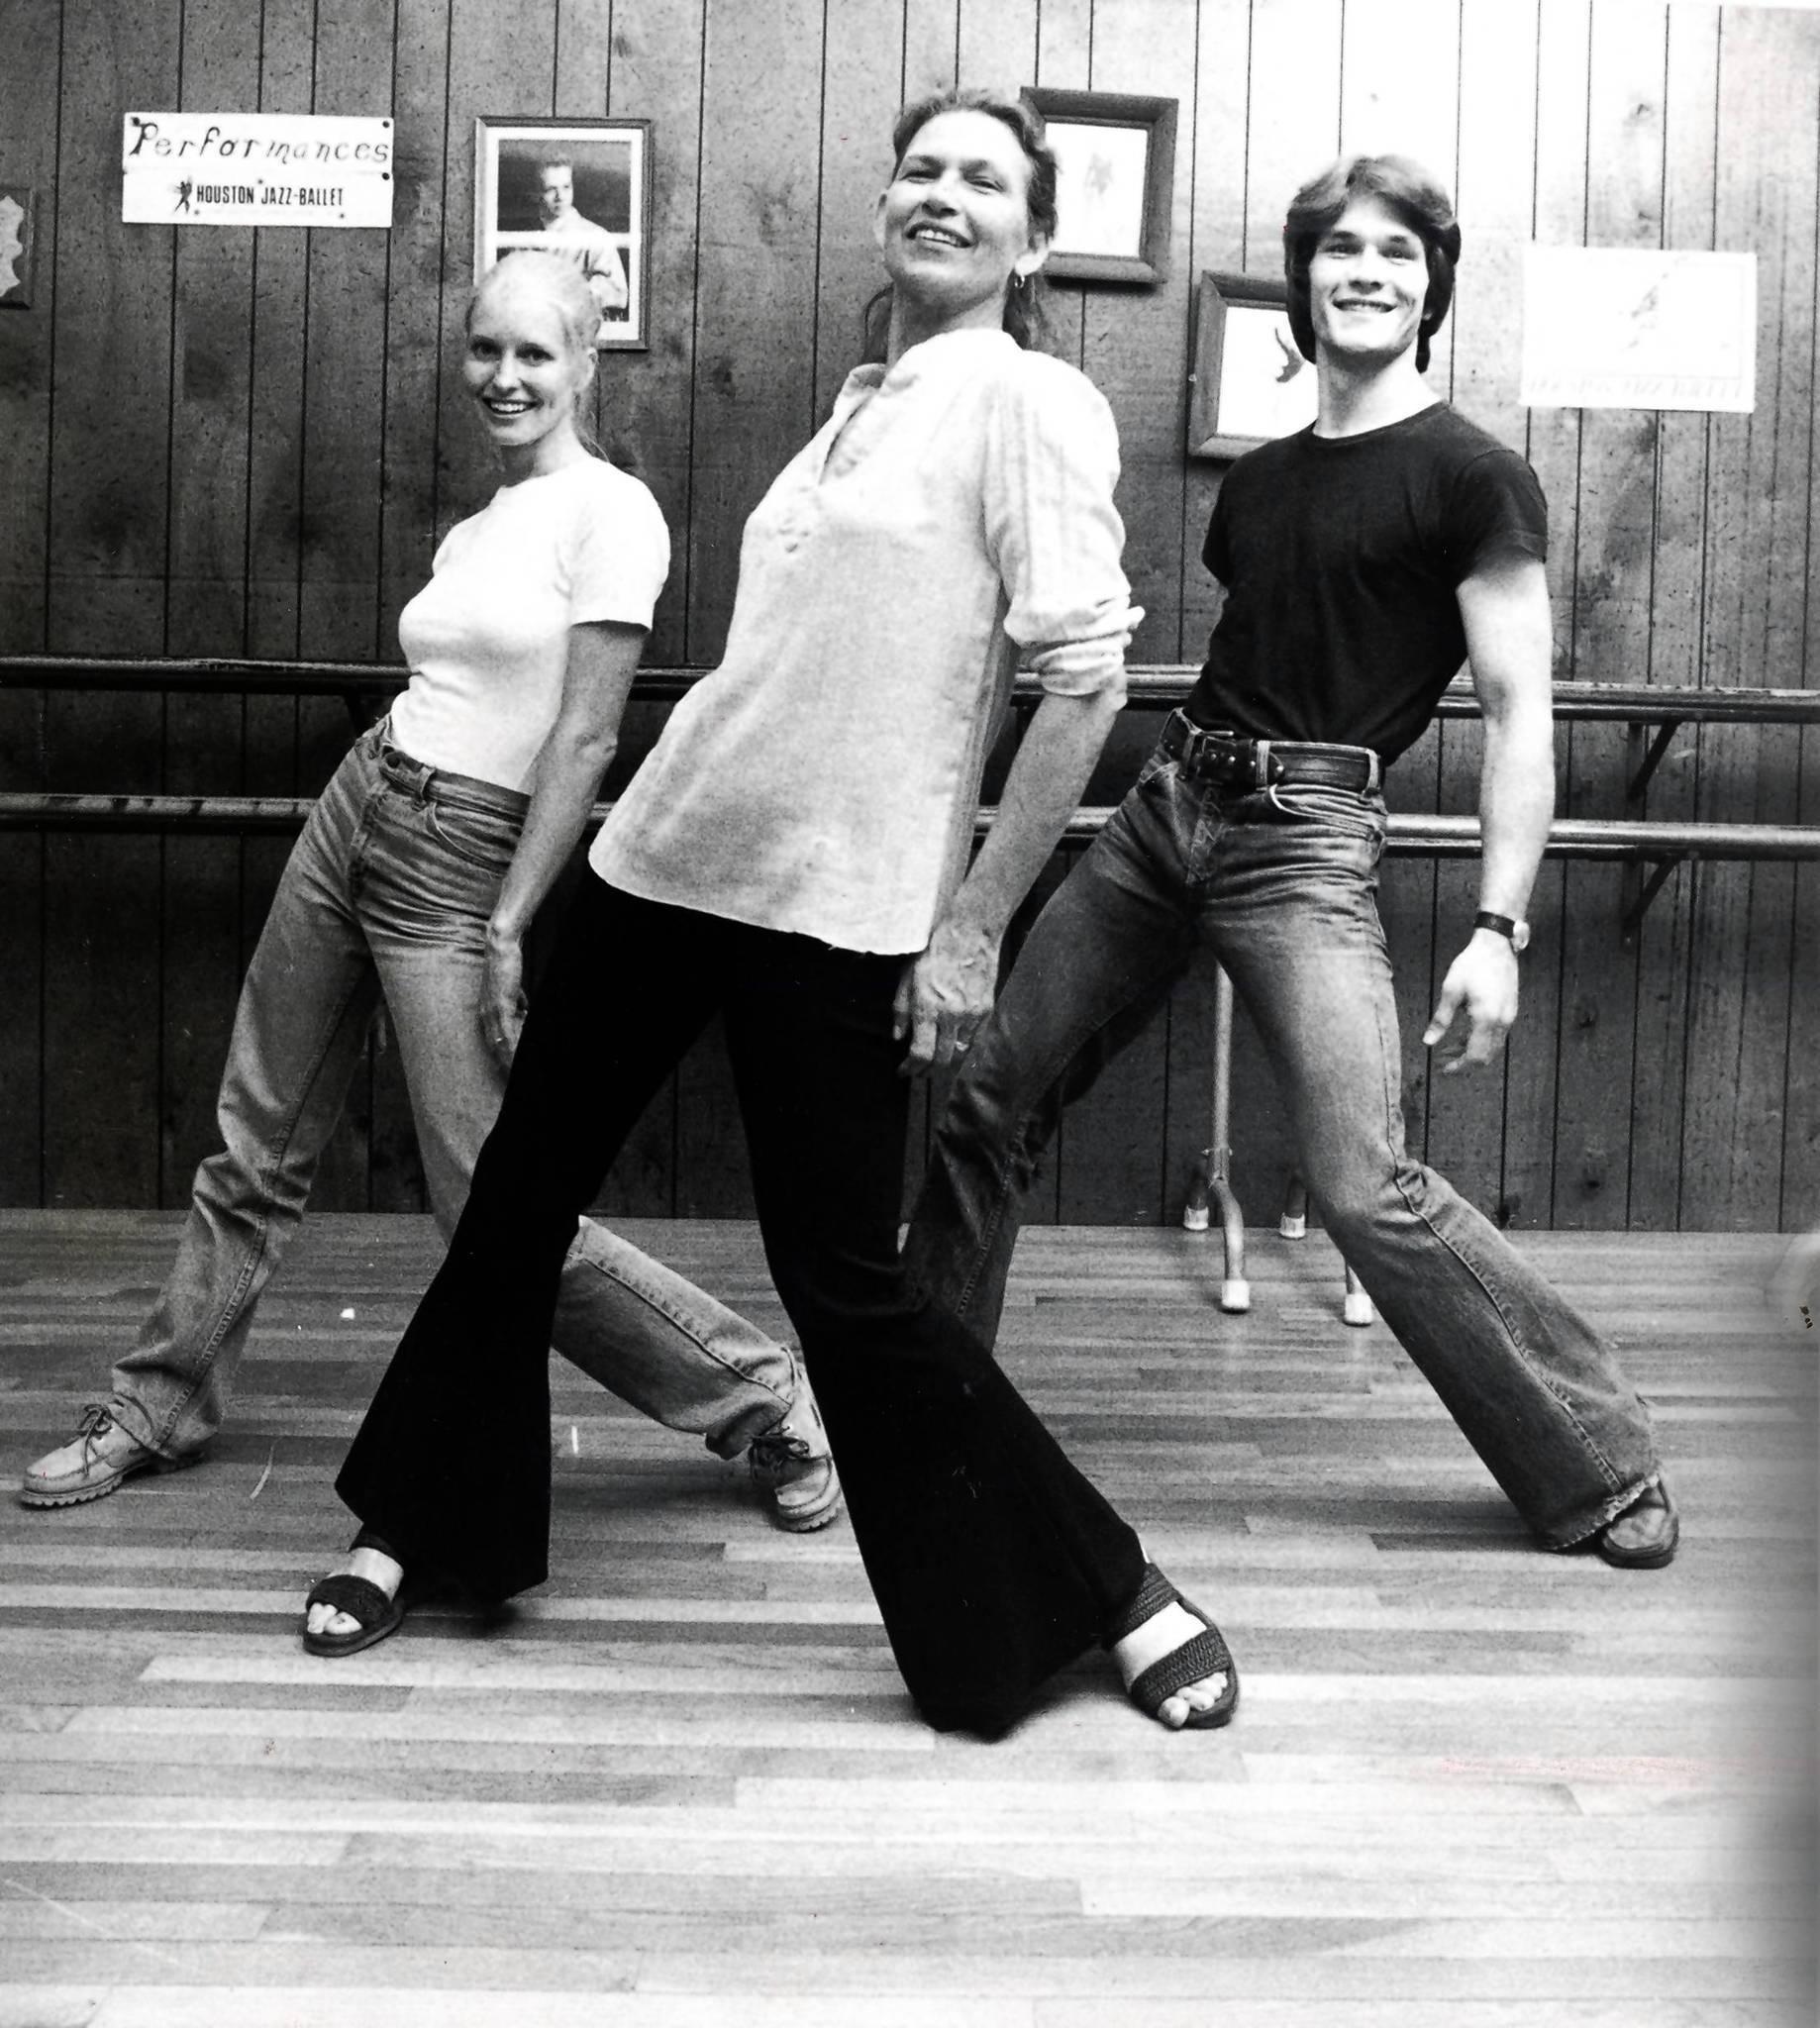 patsy swayze dies at 86 dance teacher was patrick swayze